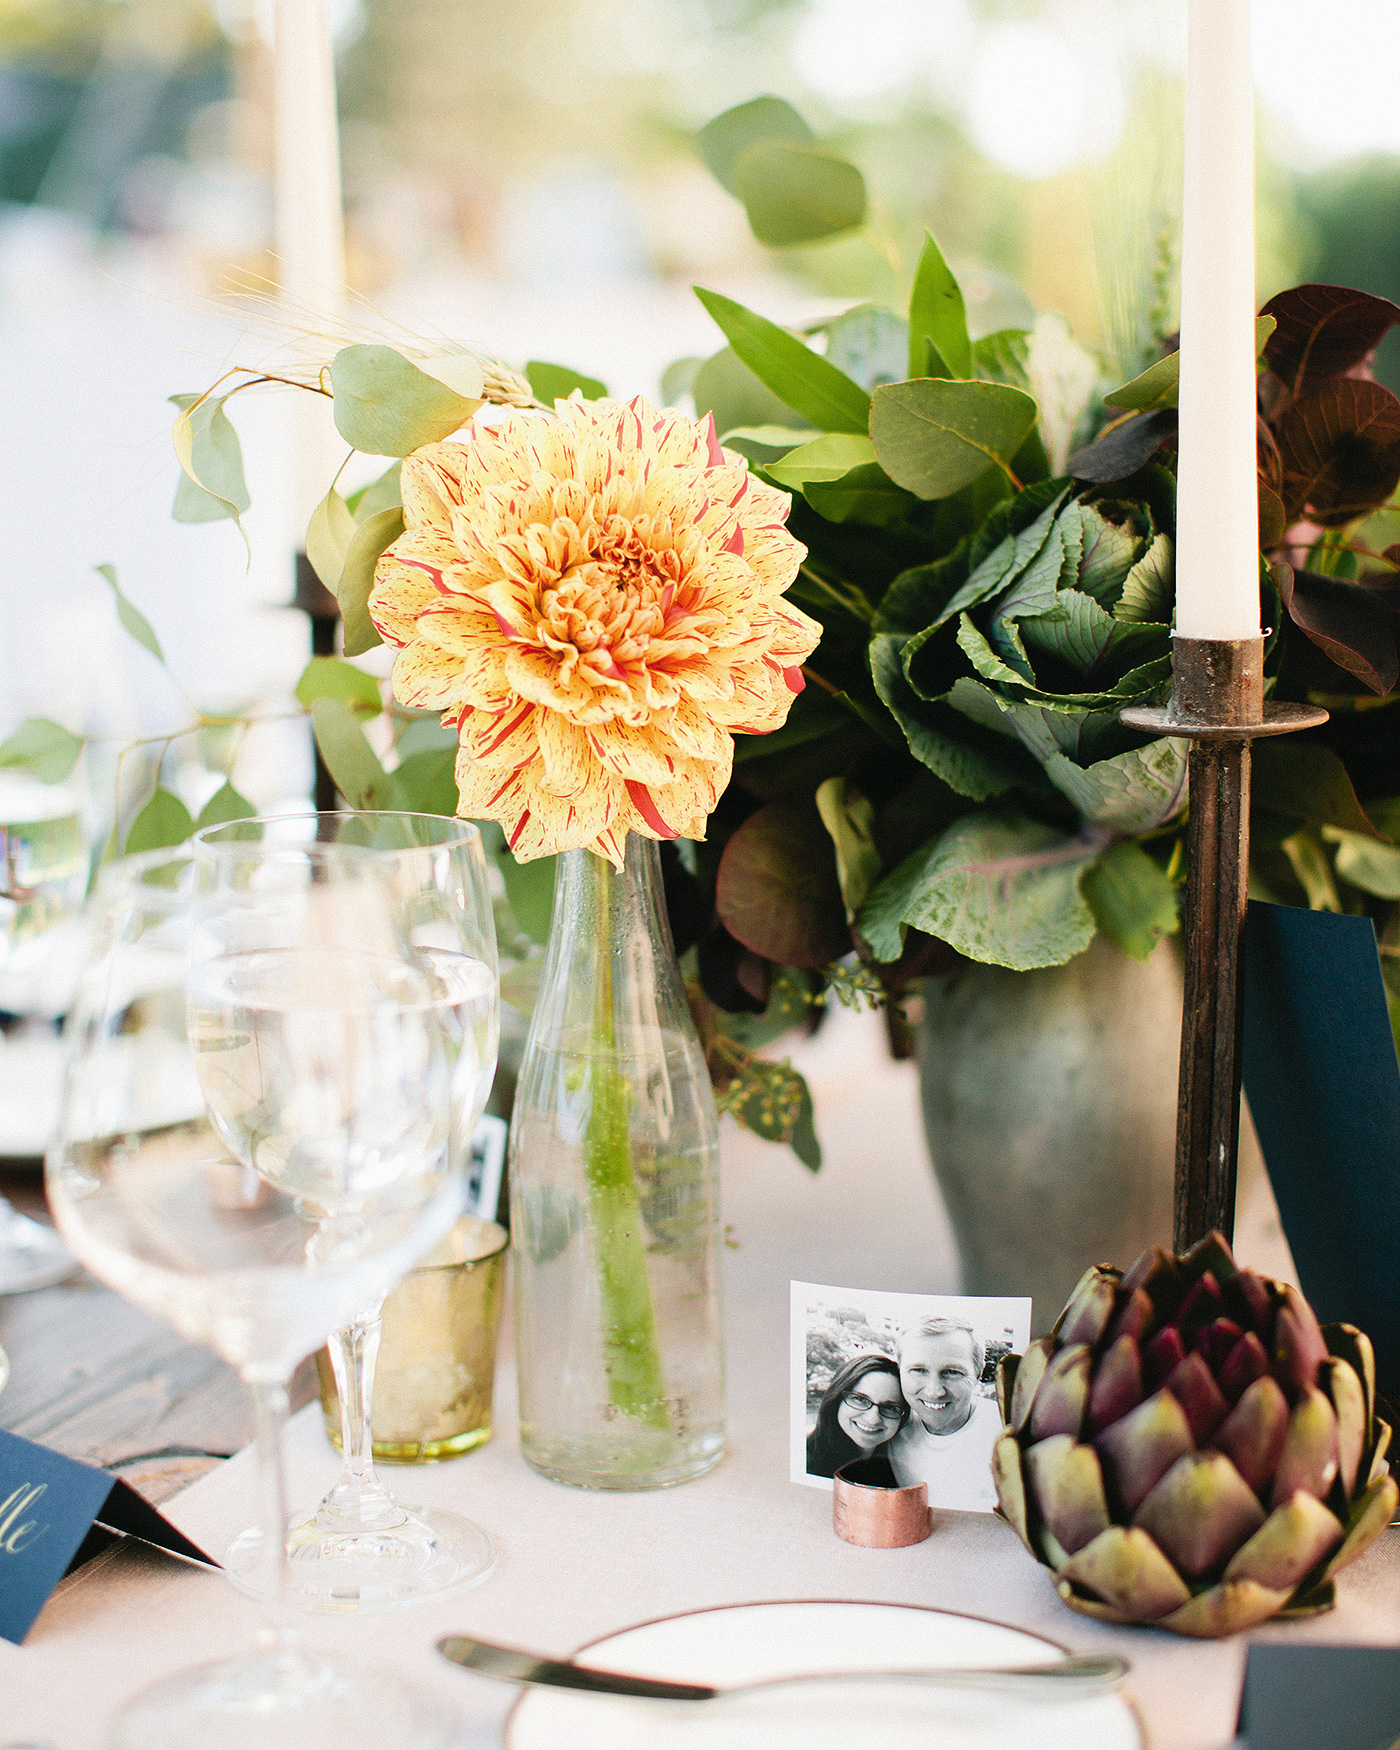 jesse-nate-wedding-centerpiece-0847-s113063-0716.jpg